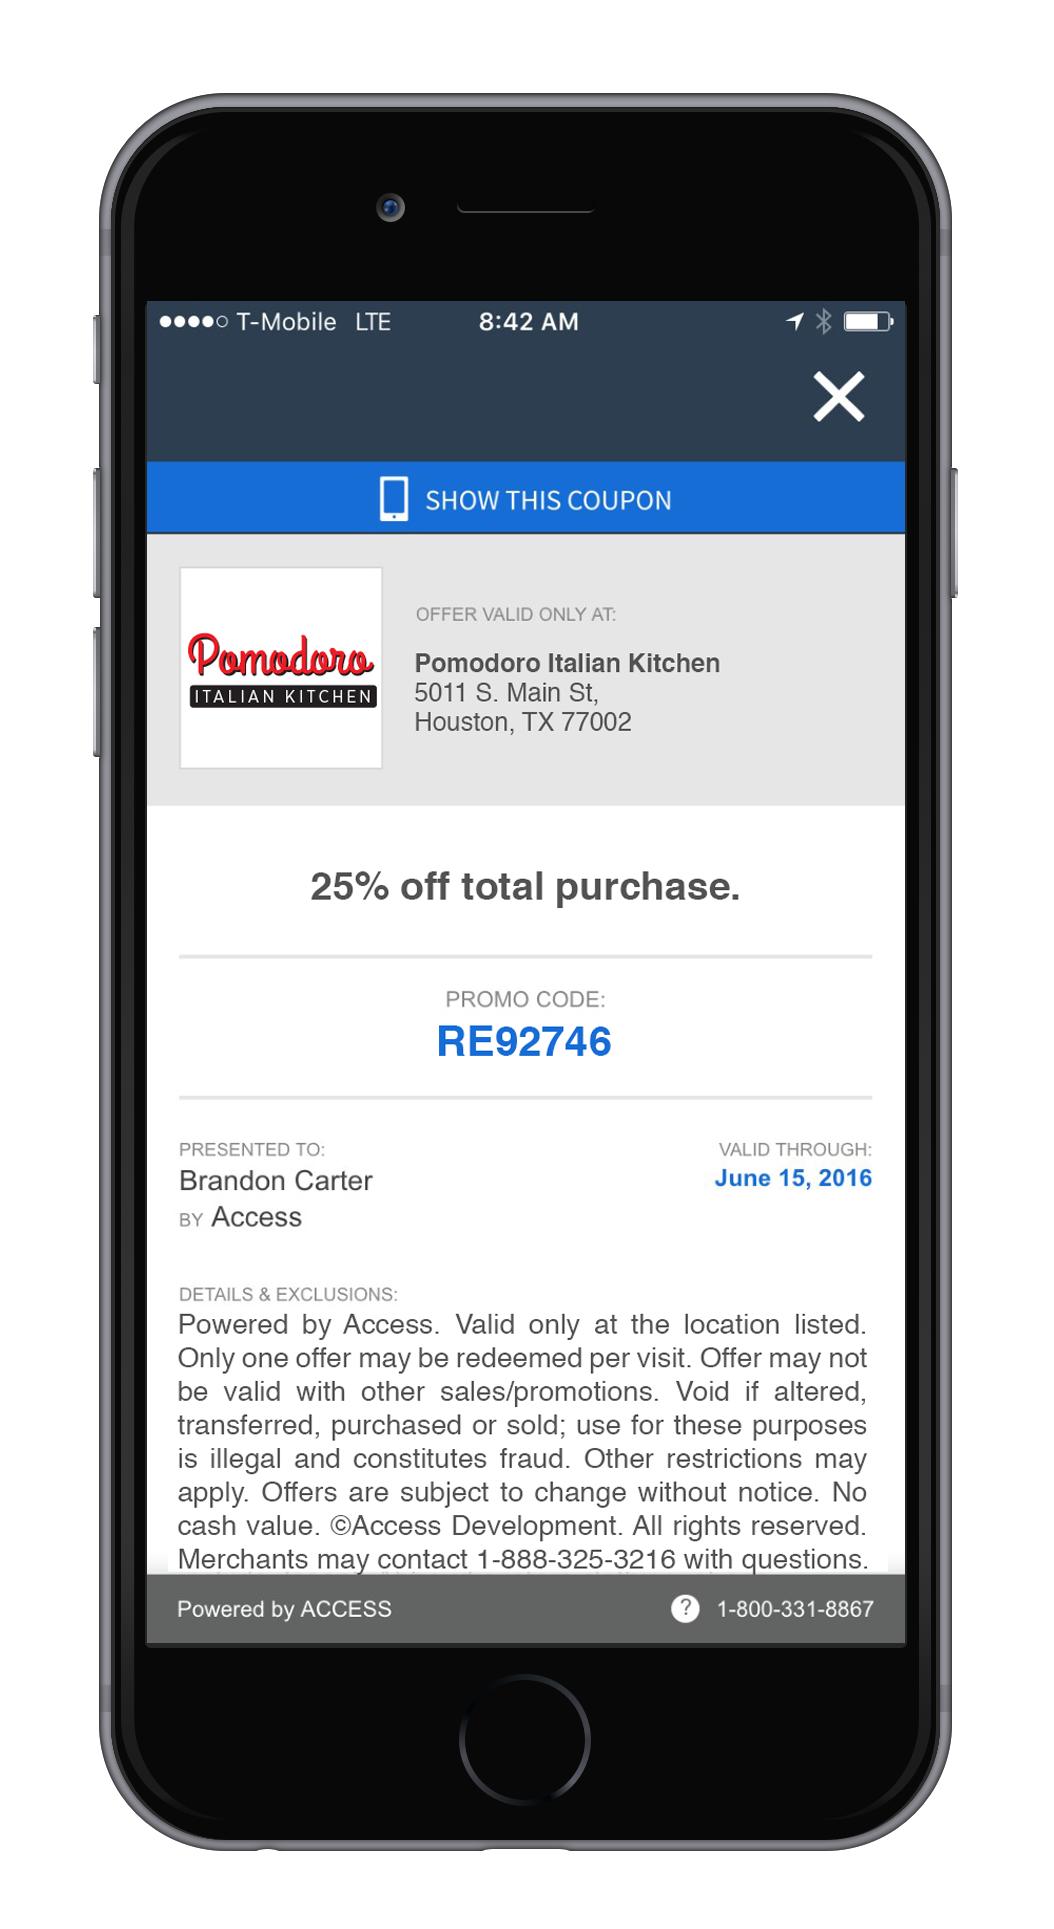 Pomodoro-iPhone6.png